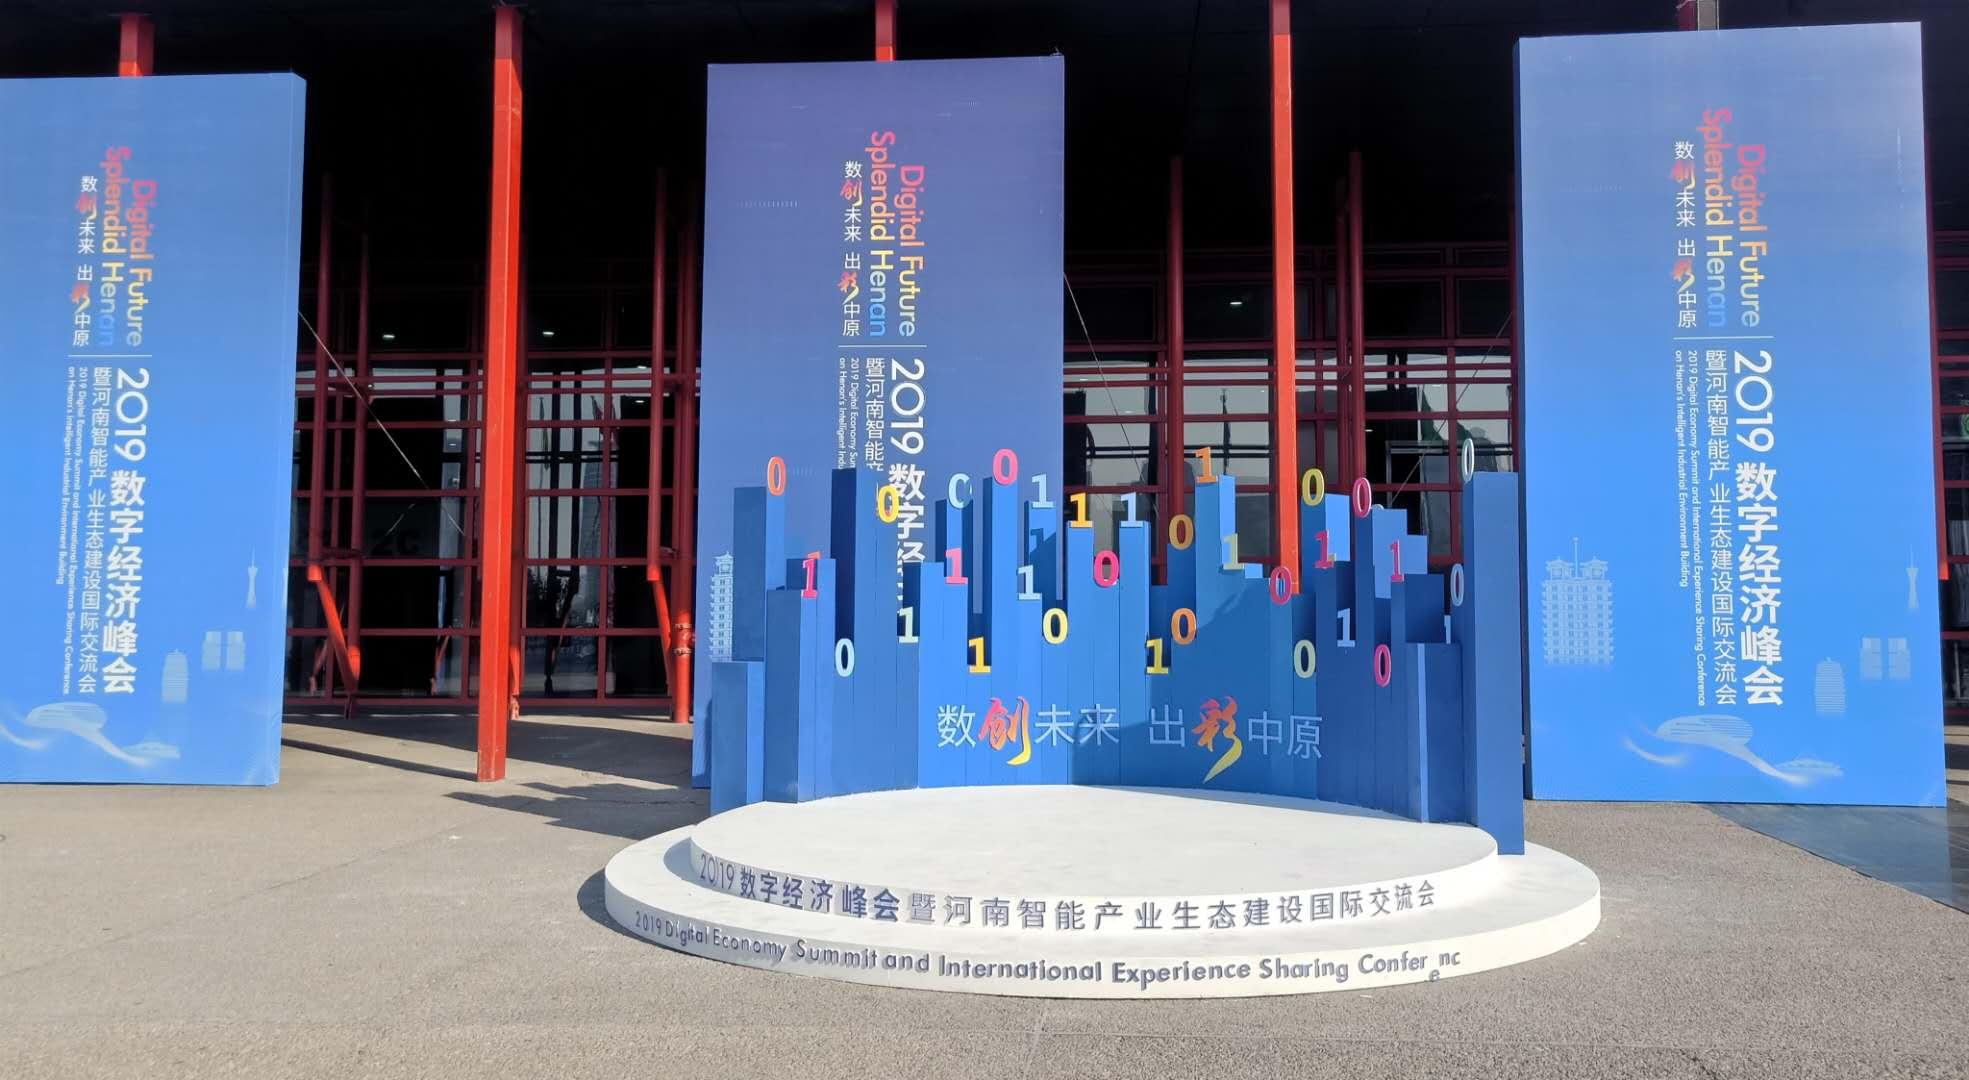 <b>中兴网信5G+产品参展2019数字经济峰会助力河南智能产业生态建设</b>